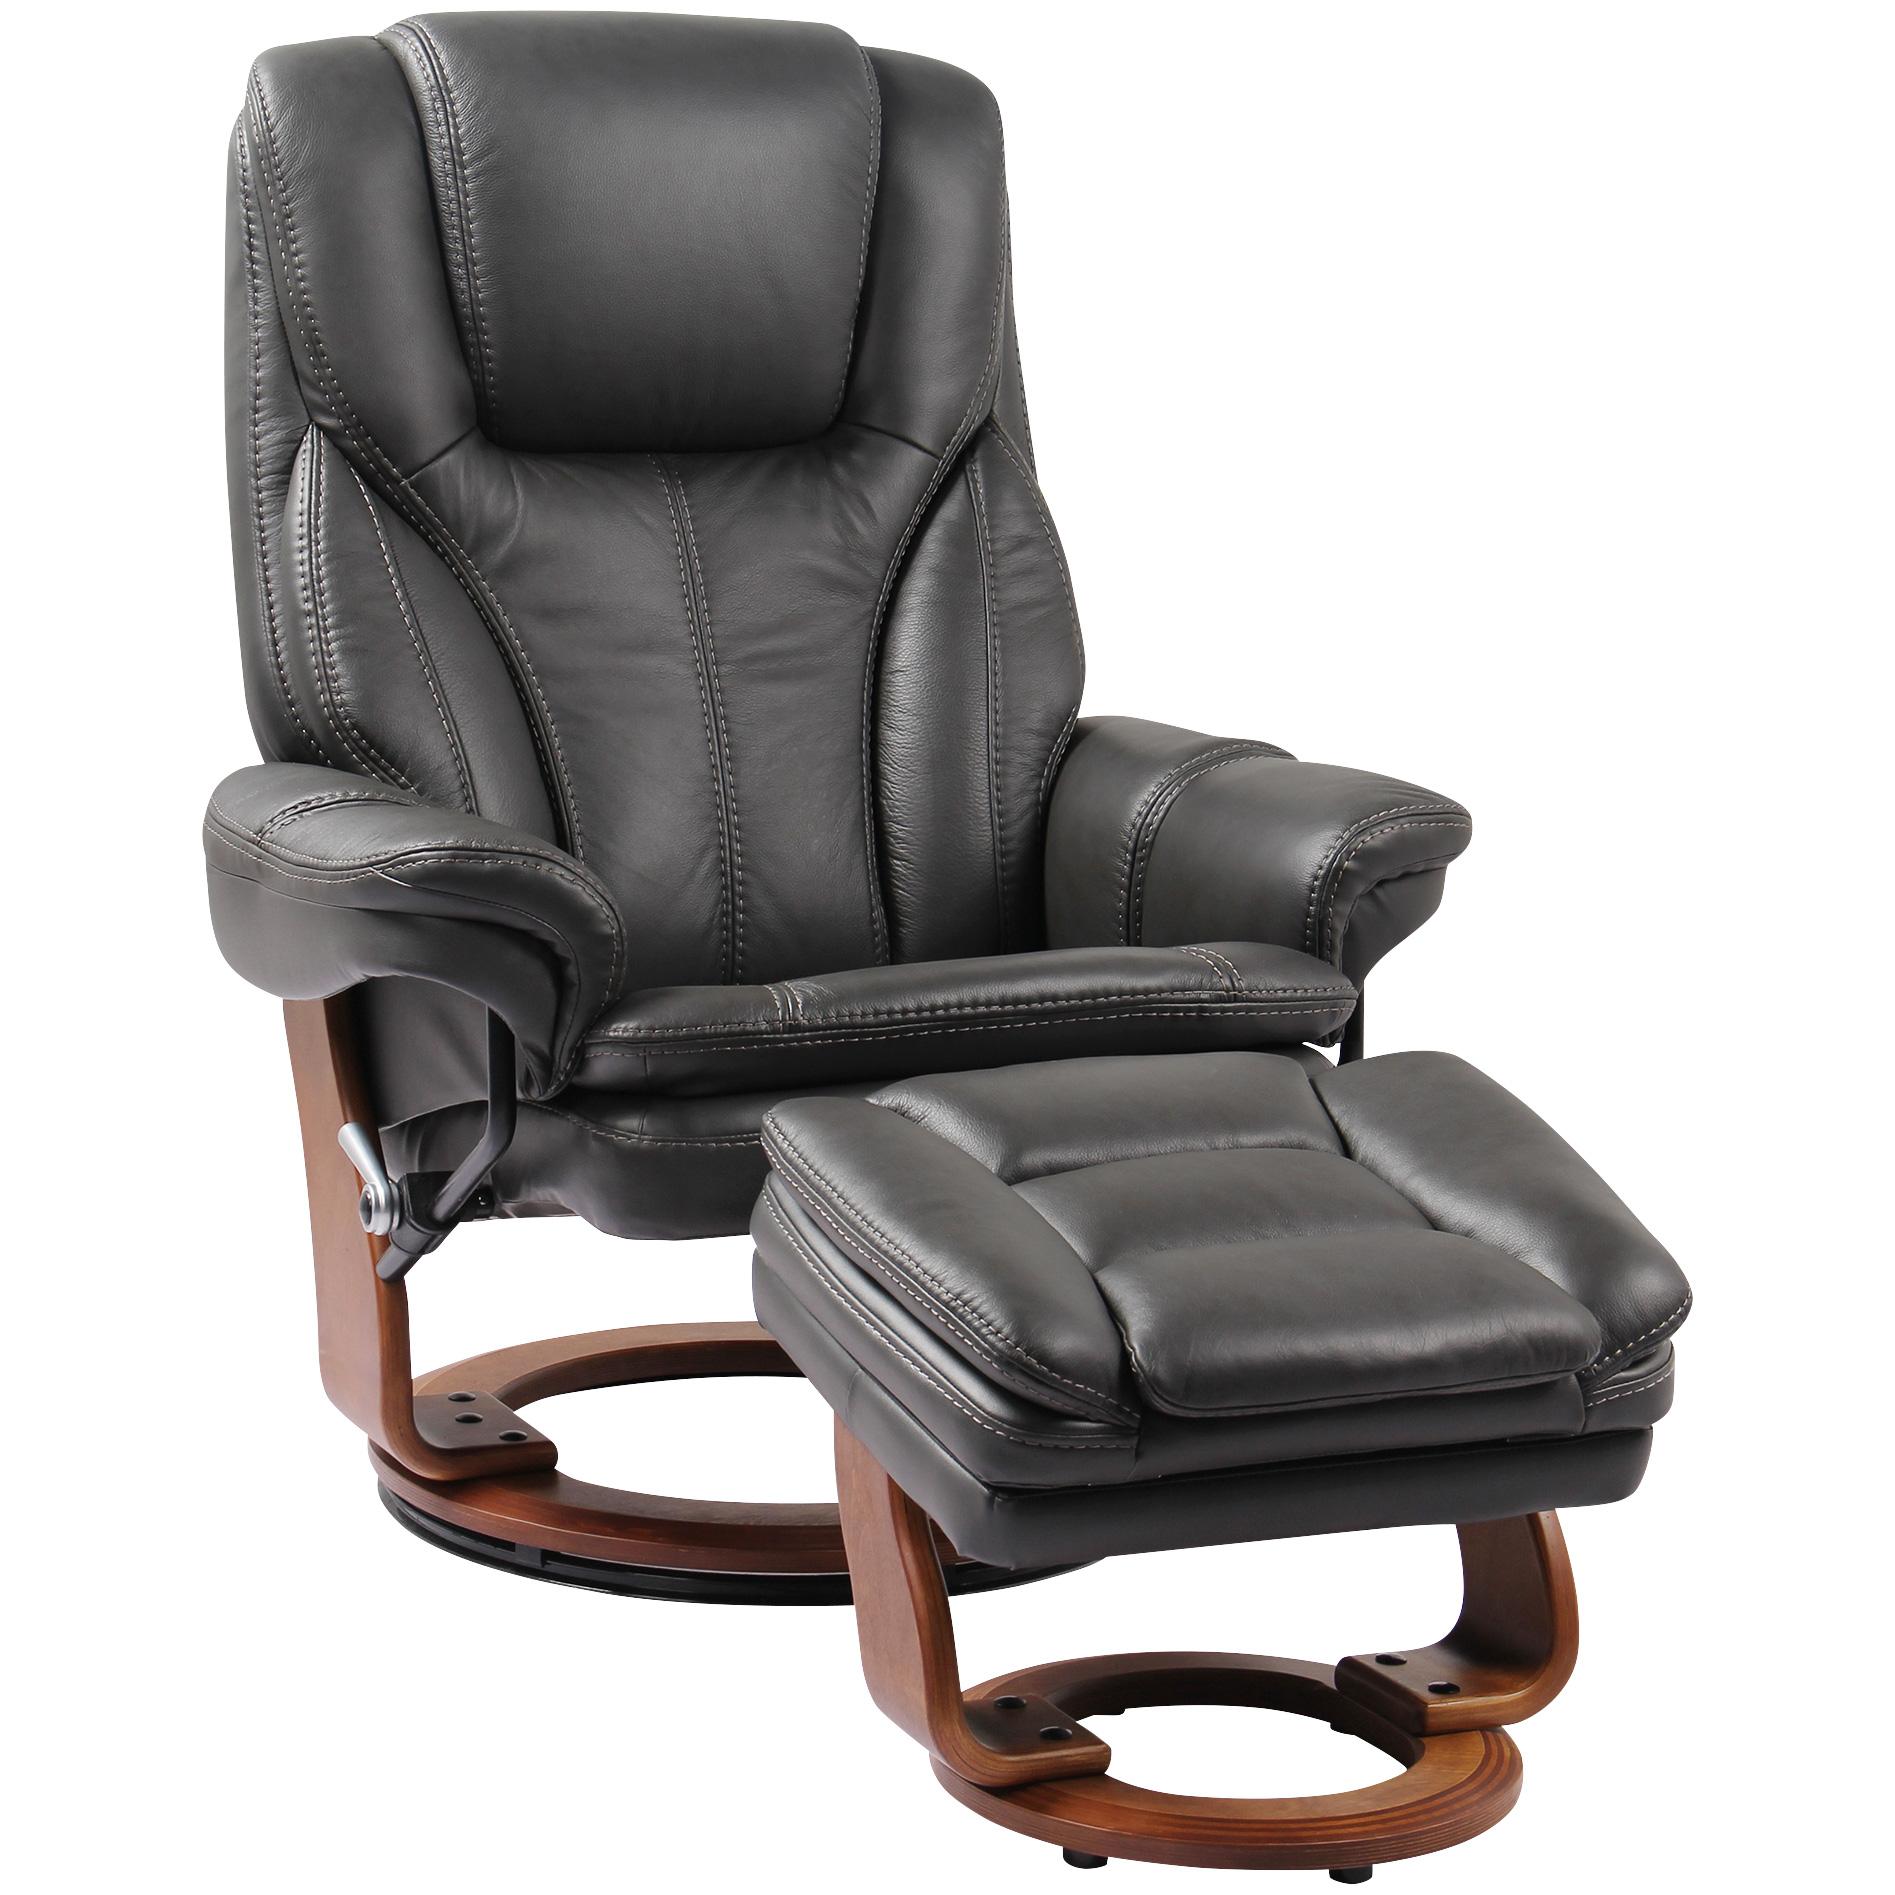 Benchmaster | Hana Gray Recliner Chair with Ottoman